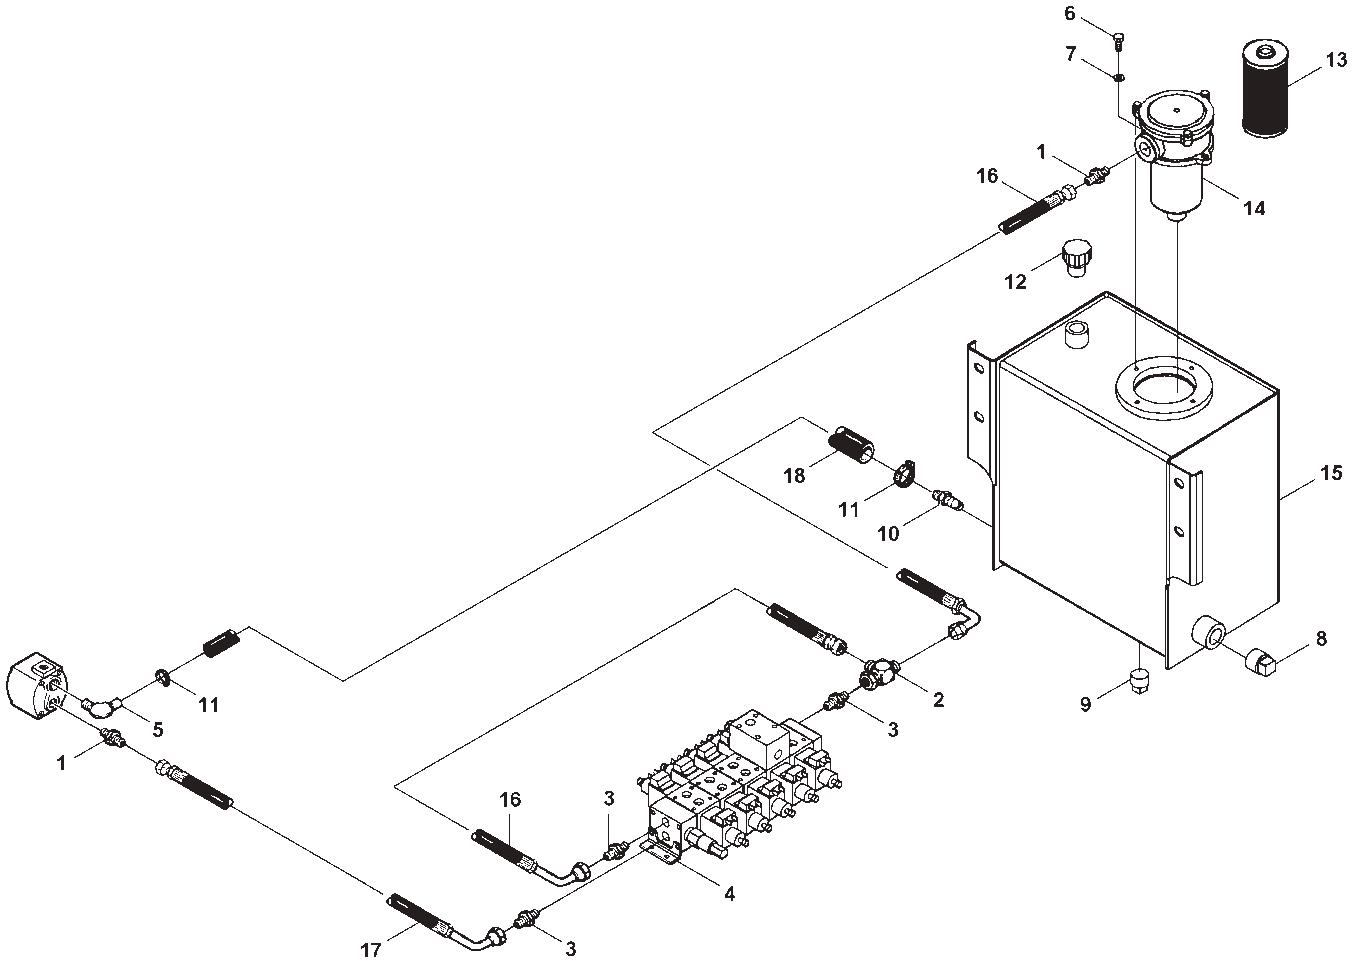 Bandsaw Wiring Diagram in addition Monarch Hydraulic Pump Wiring Diagram furthermore Electric Over Hydraulic Wiring Diagrams besides Ez Go Gas Golf Cart Wiring Diagram also Dump Trailer Control Wiring Diagram. on lowrider hydraulic wiring diagram